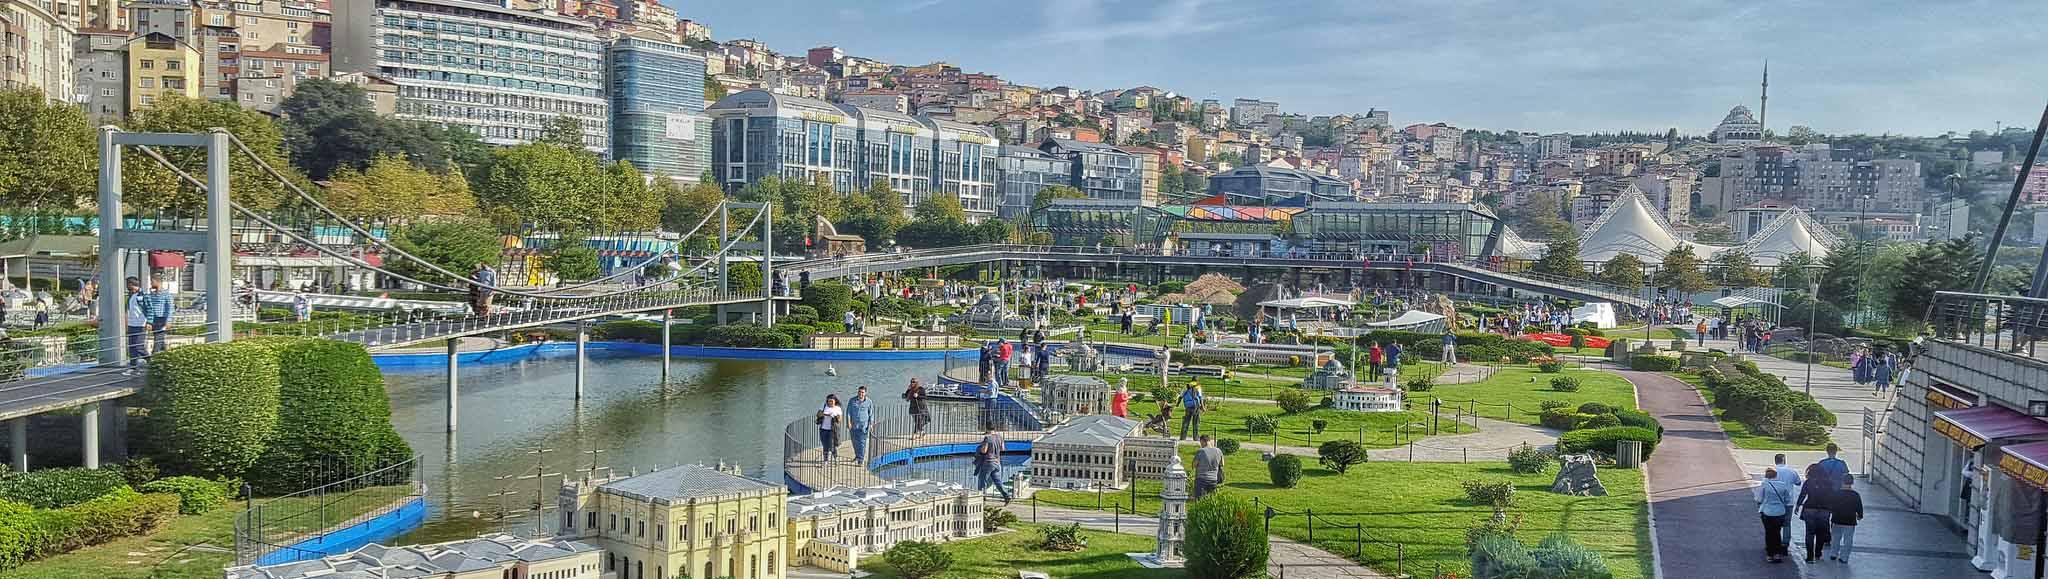 Парк миниатюр в Стамбуле, Турция